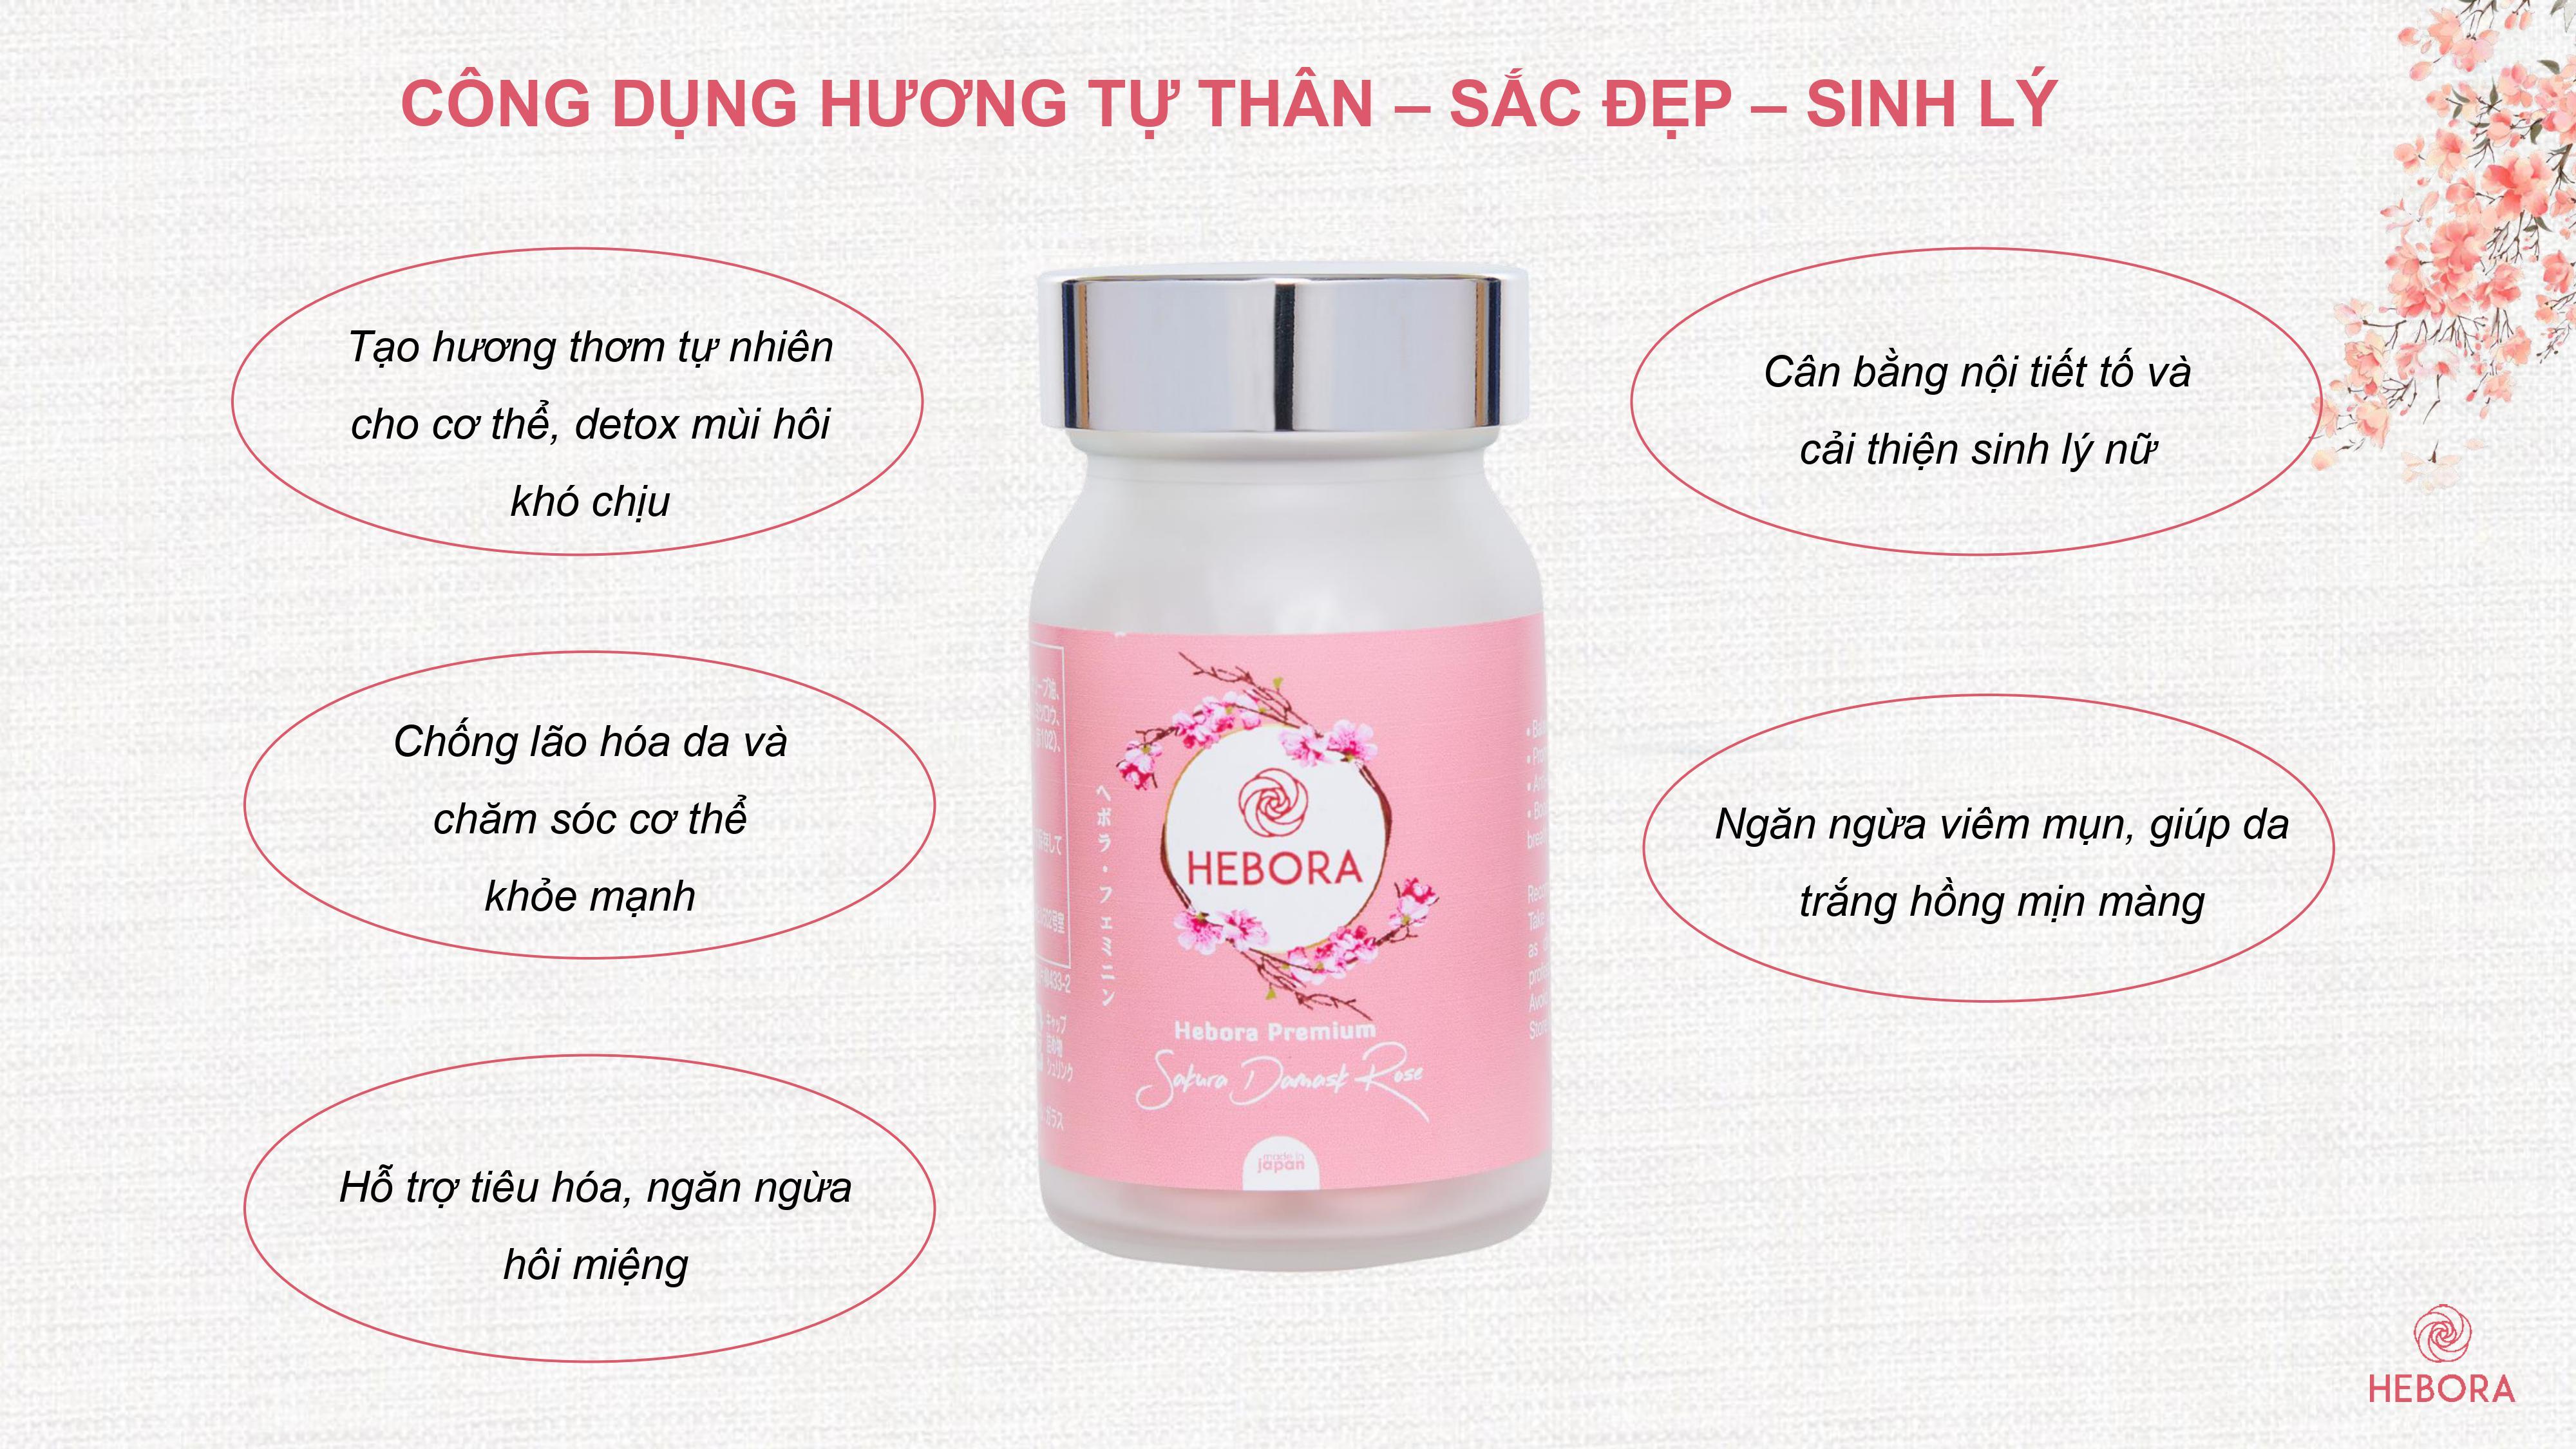 Cong Dung